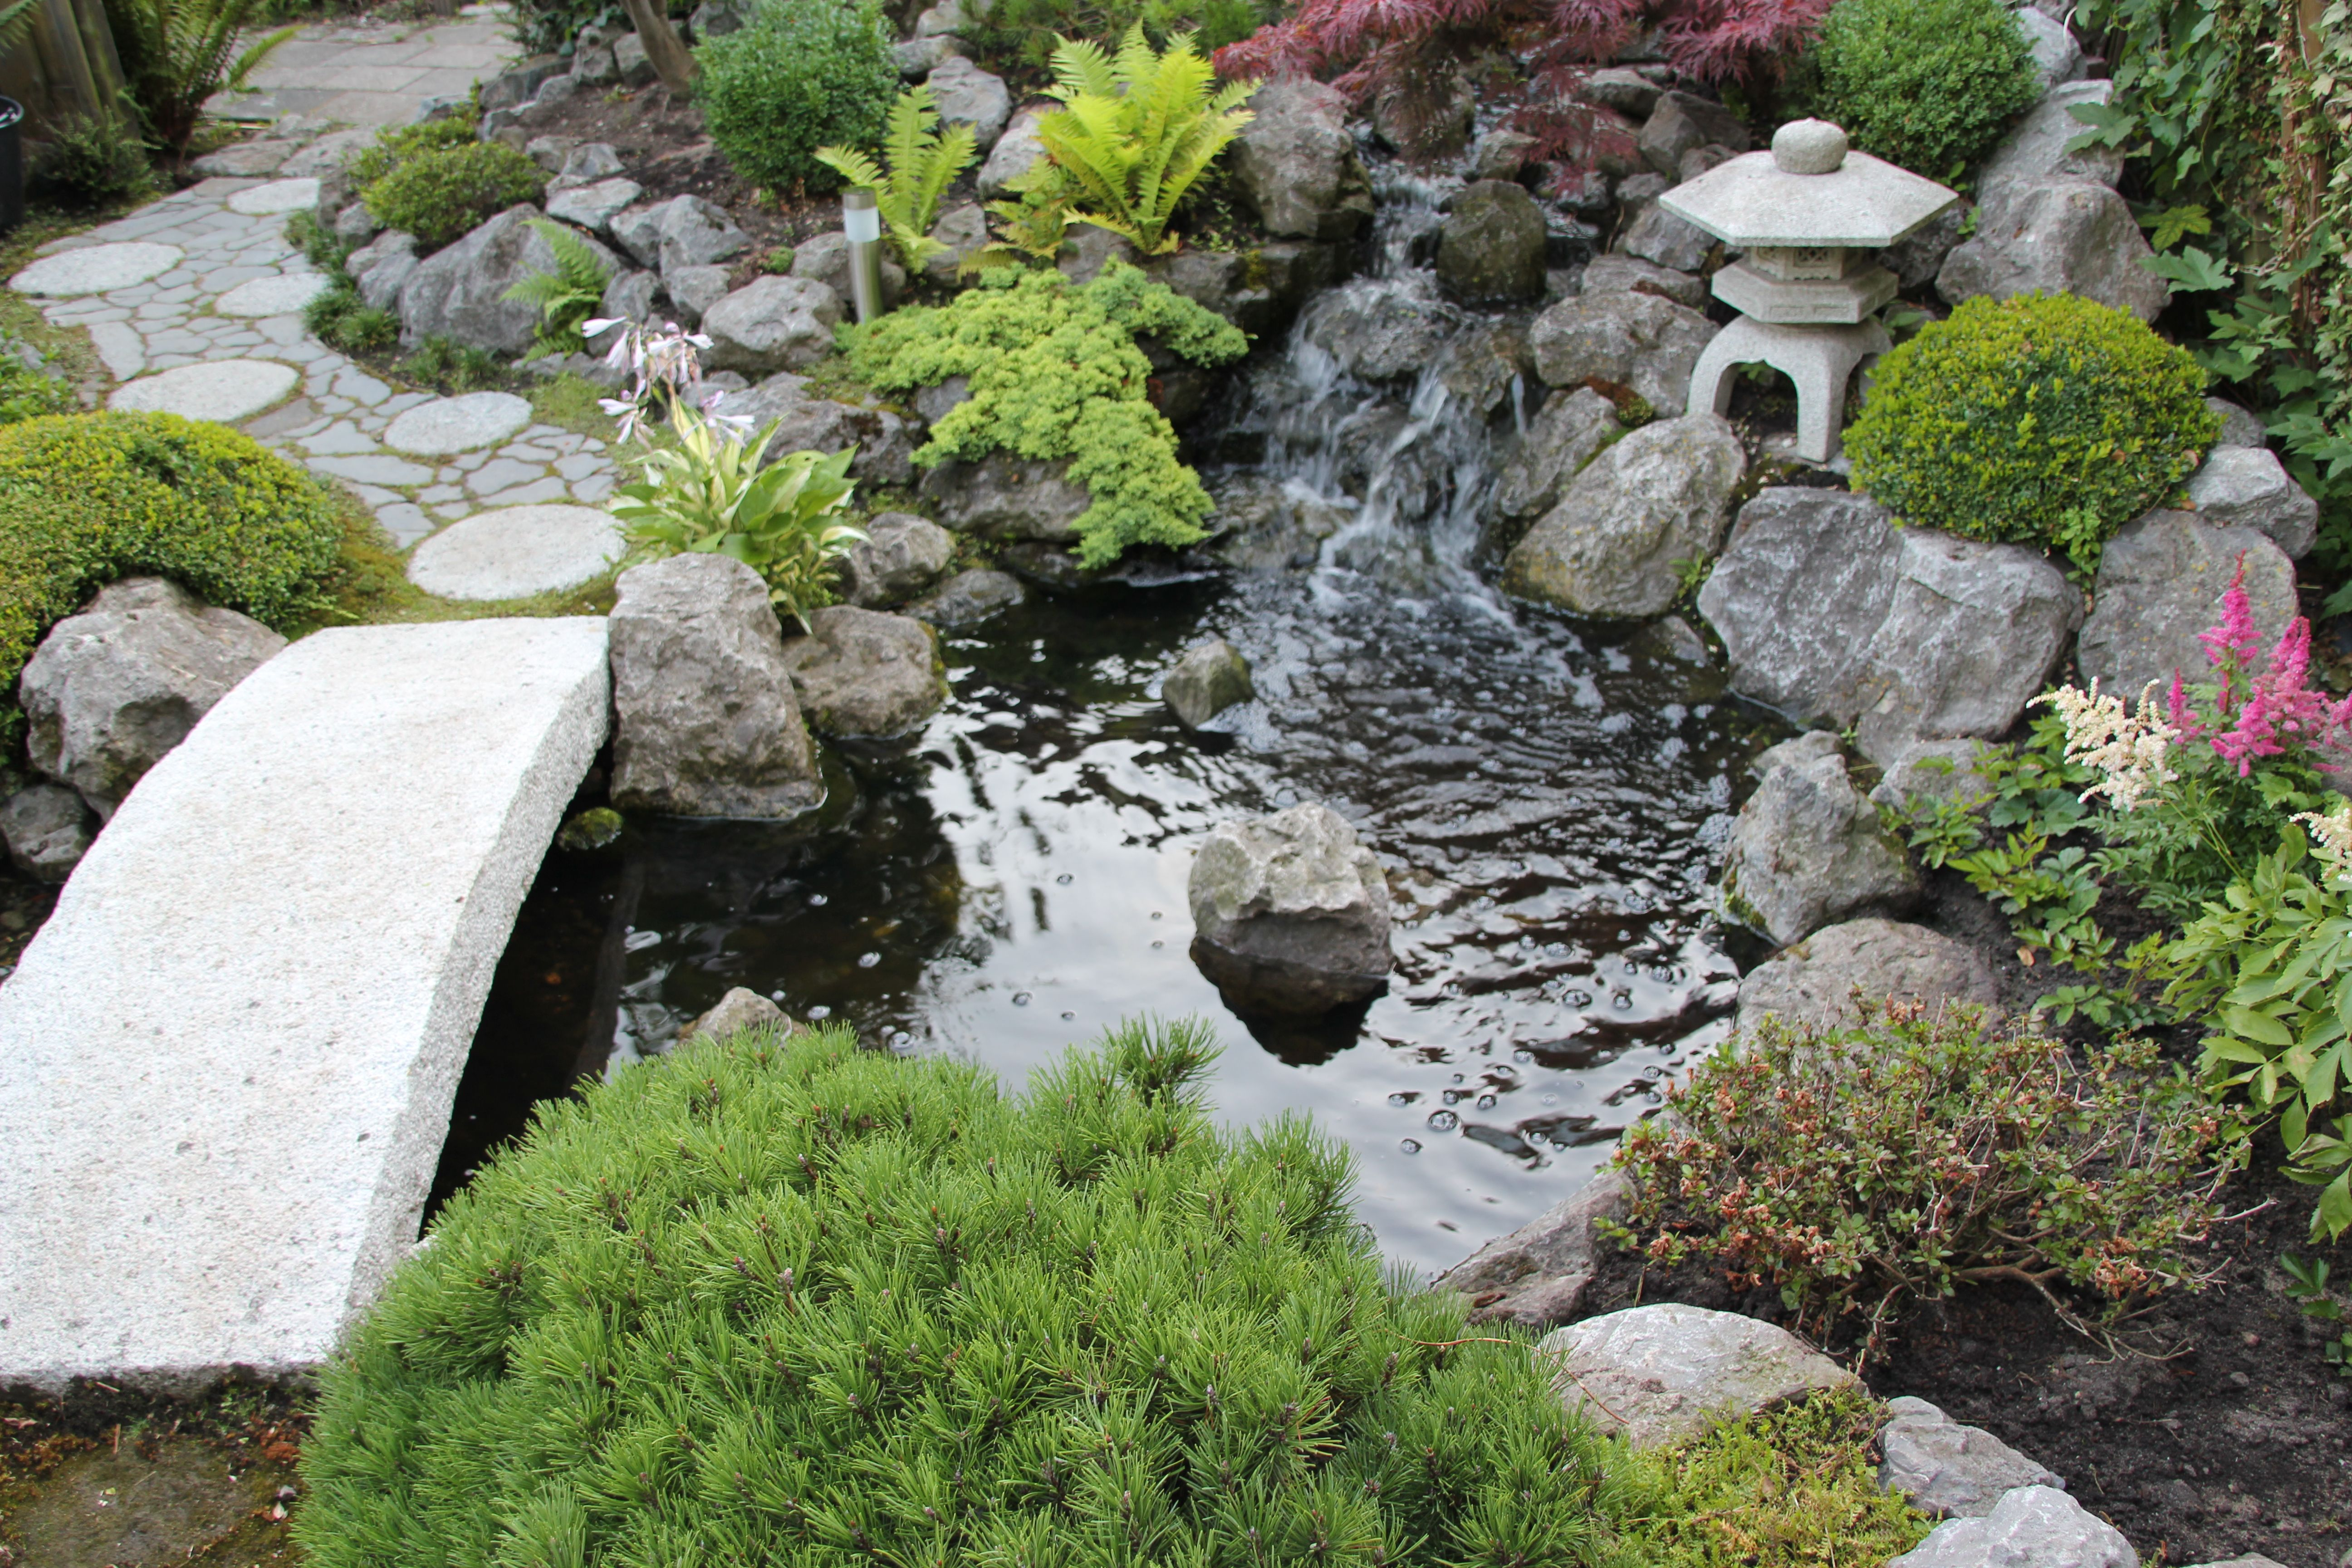 Oosterse Tuin Met Typerende Loopbrug Over Een Robuuste Vijver